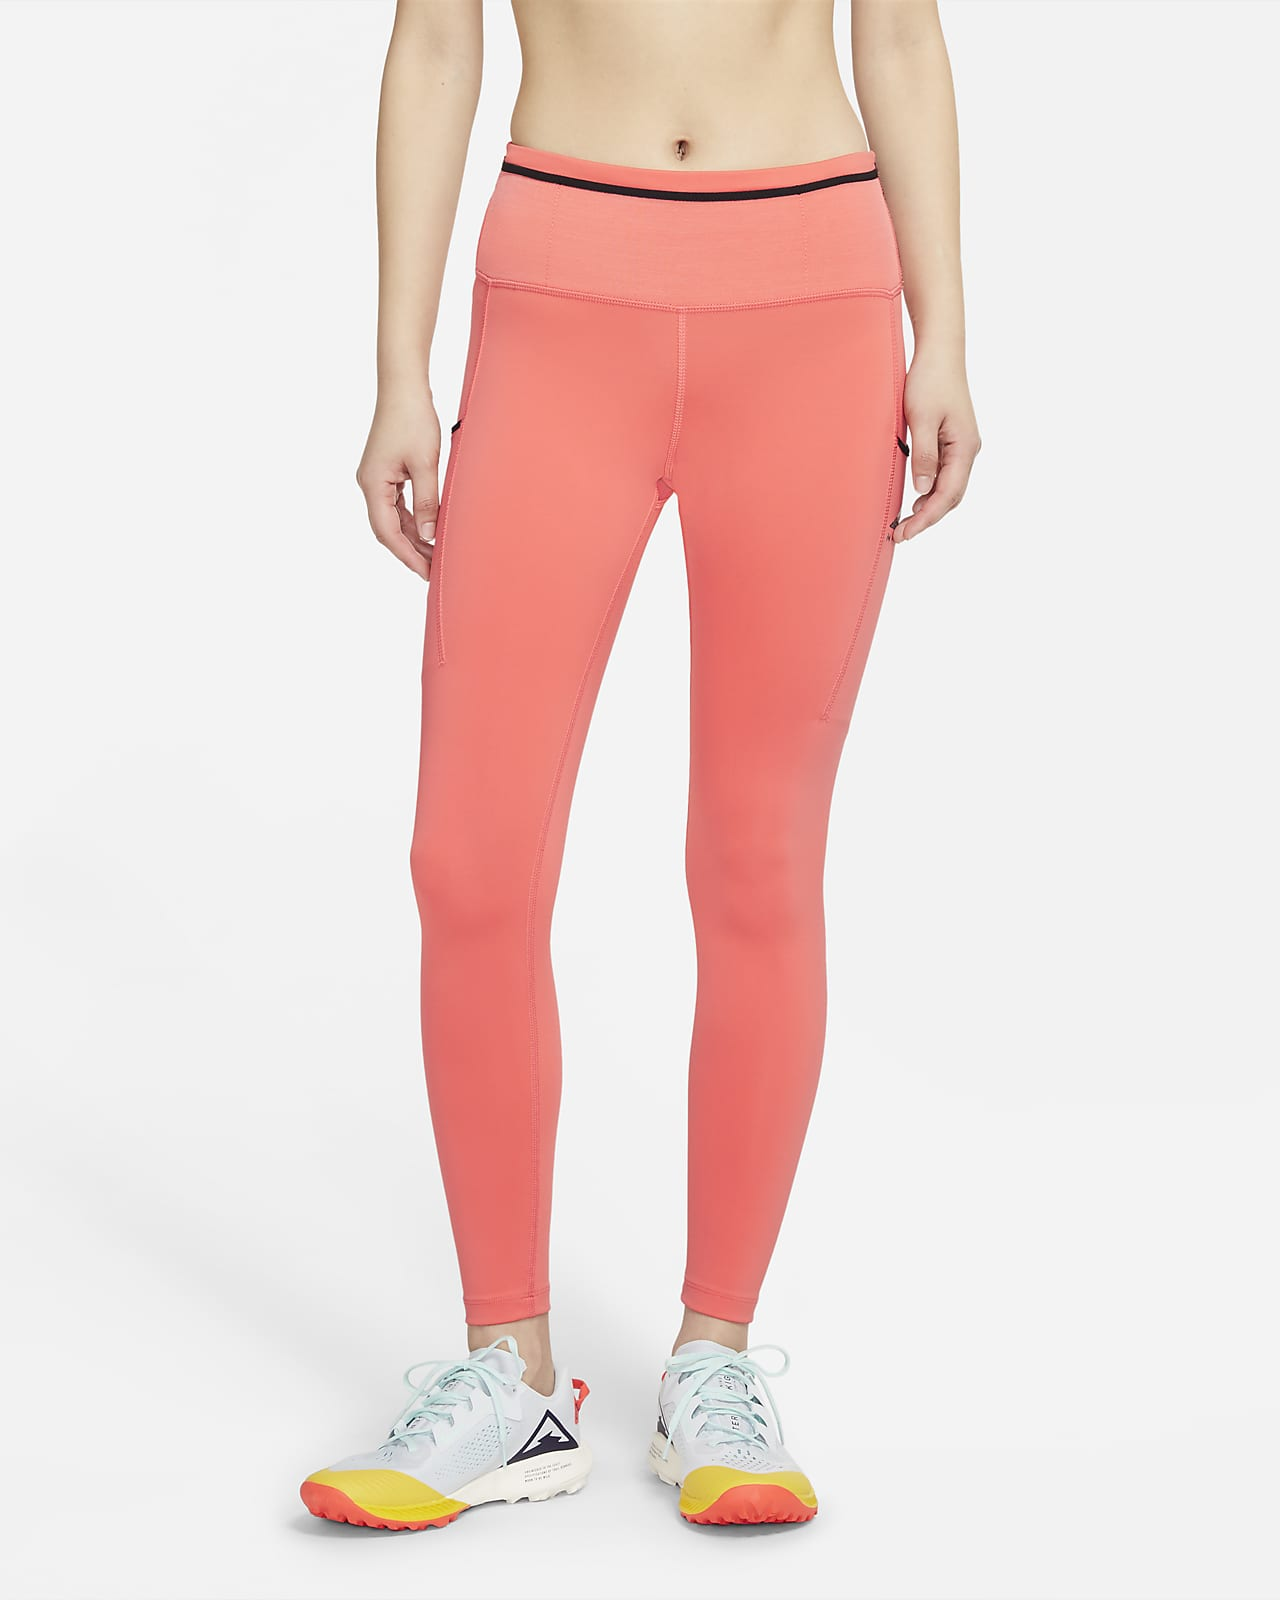 Nike Epic Luxe 女款中腰越野跑步內搭褲